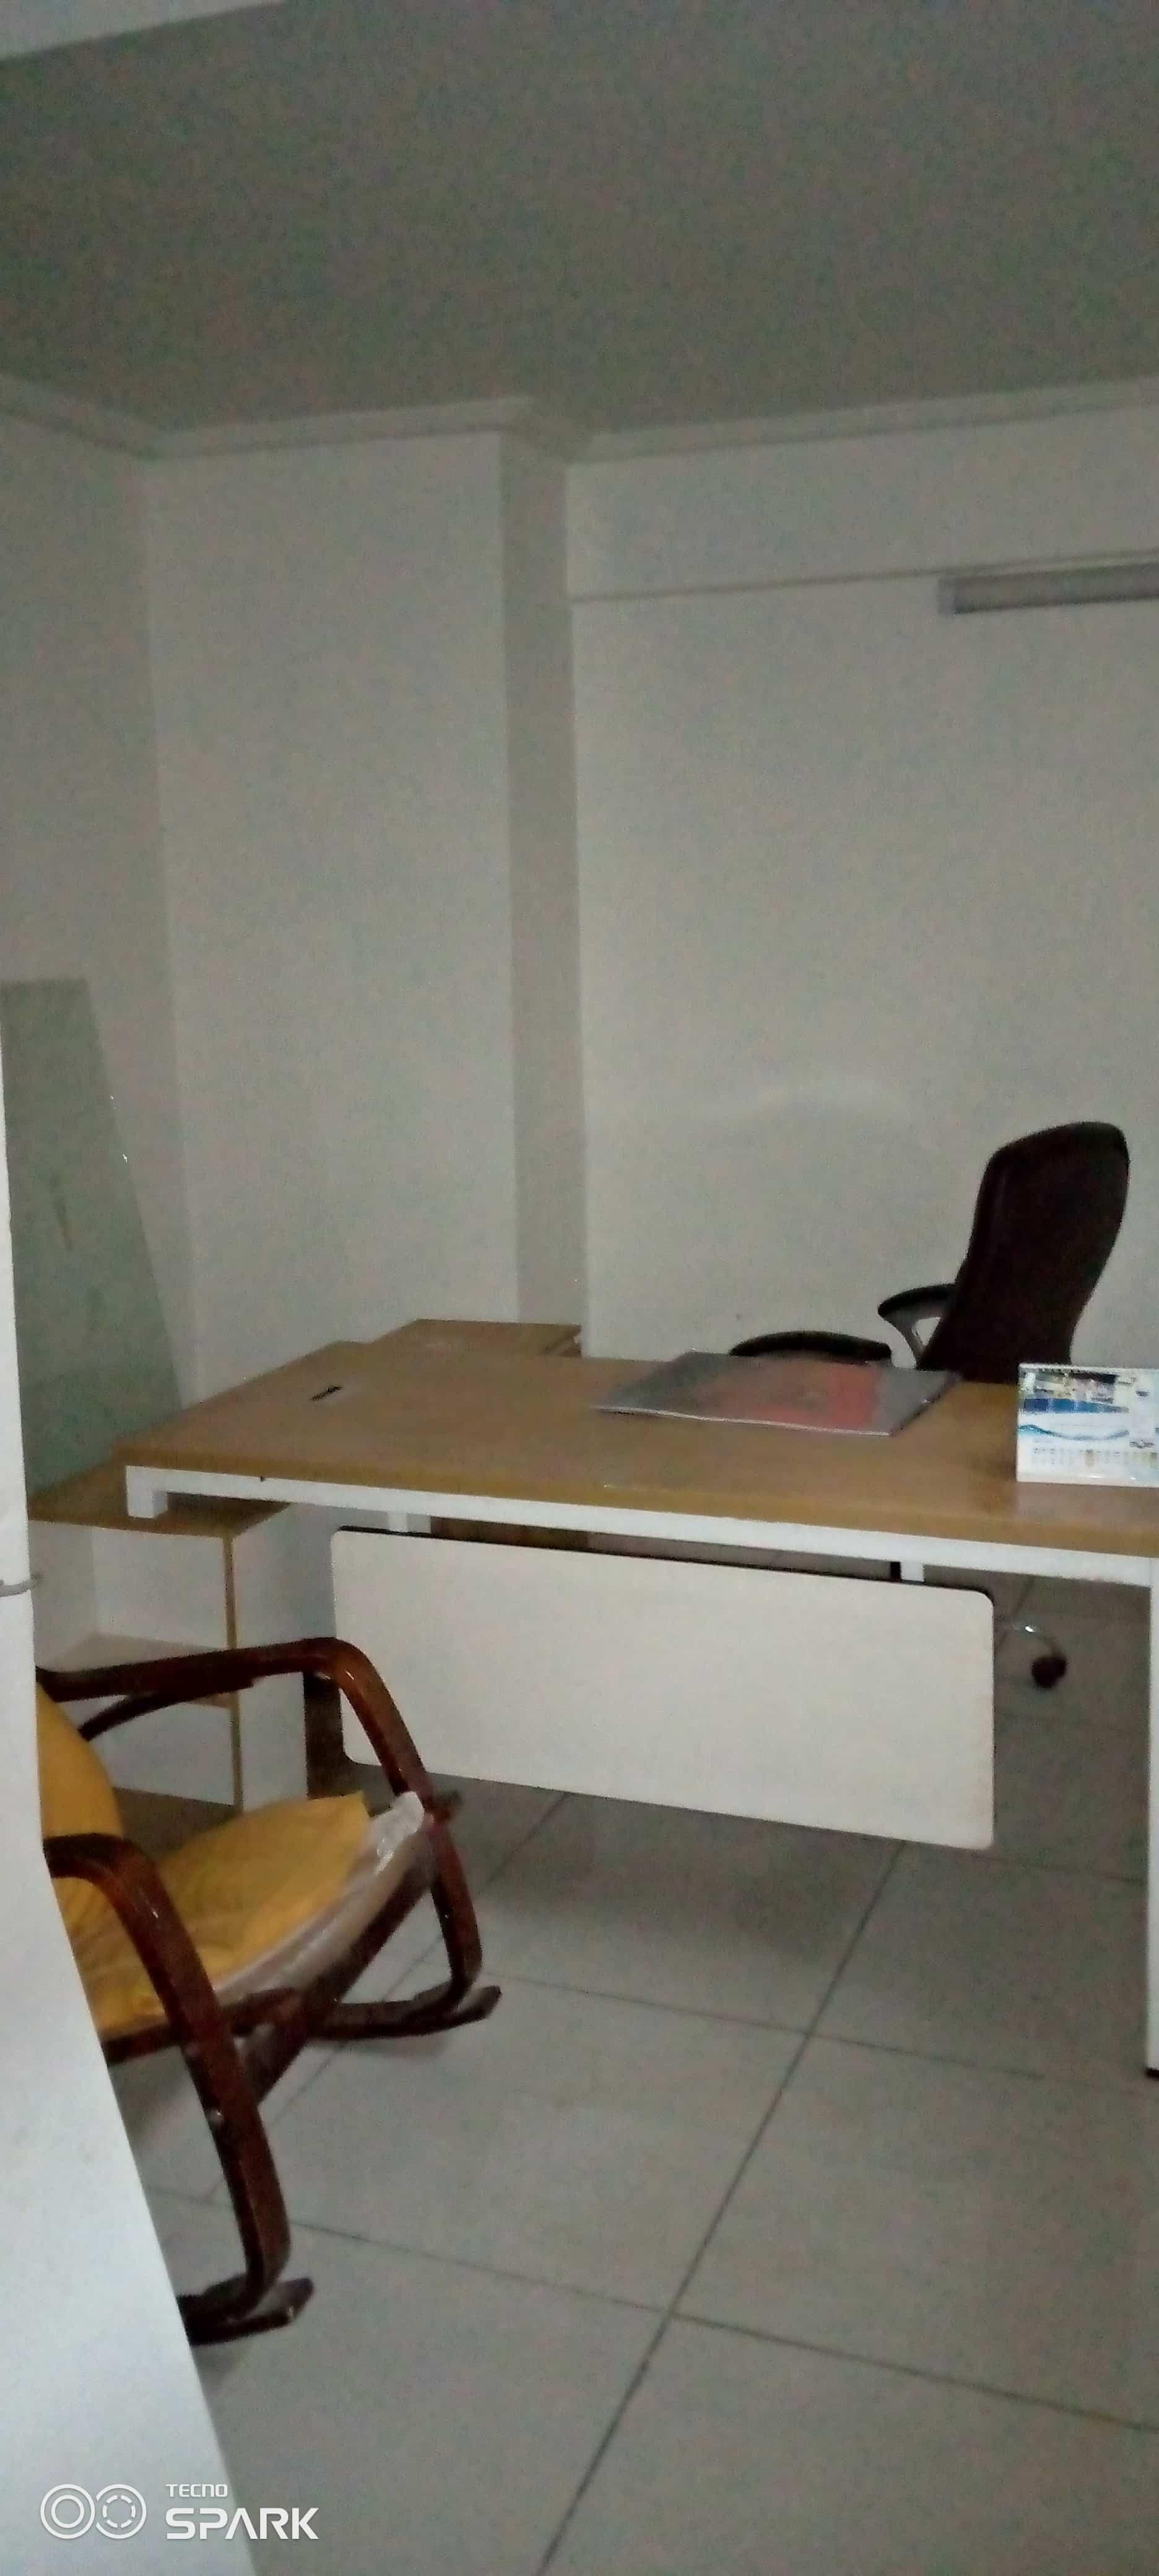 Office to rent at Yaoundé, Bastos, Pas loin de l'ambassade - 200 m2 - 1 500 000 FCFA